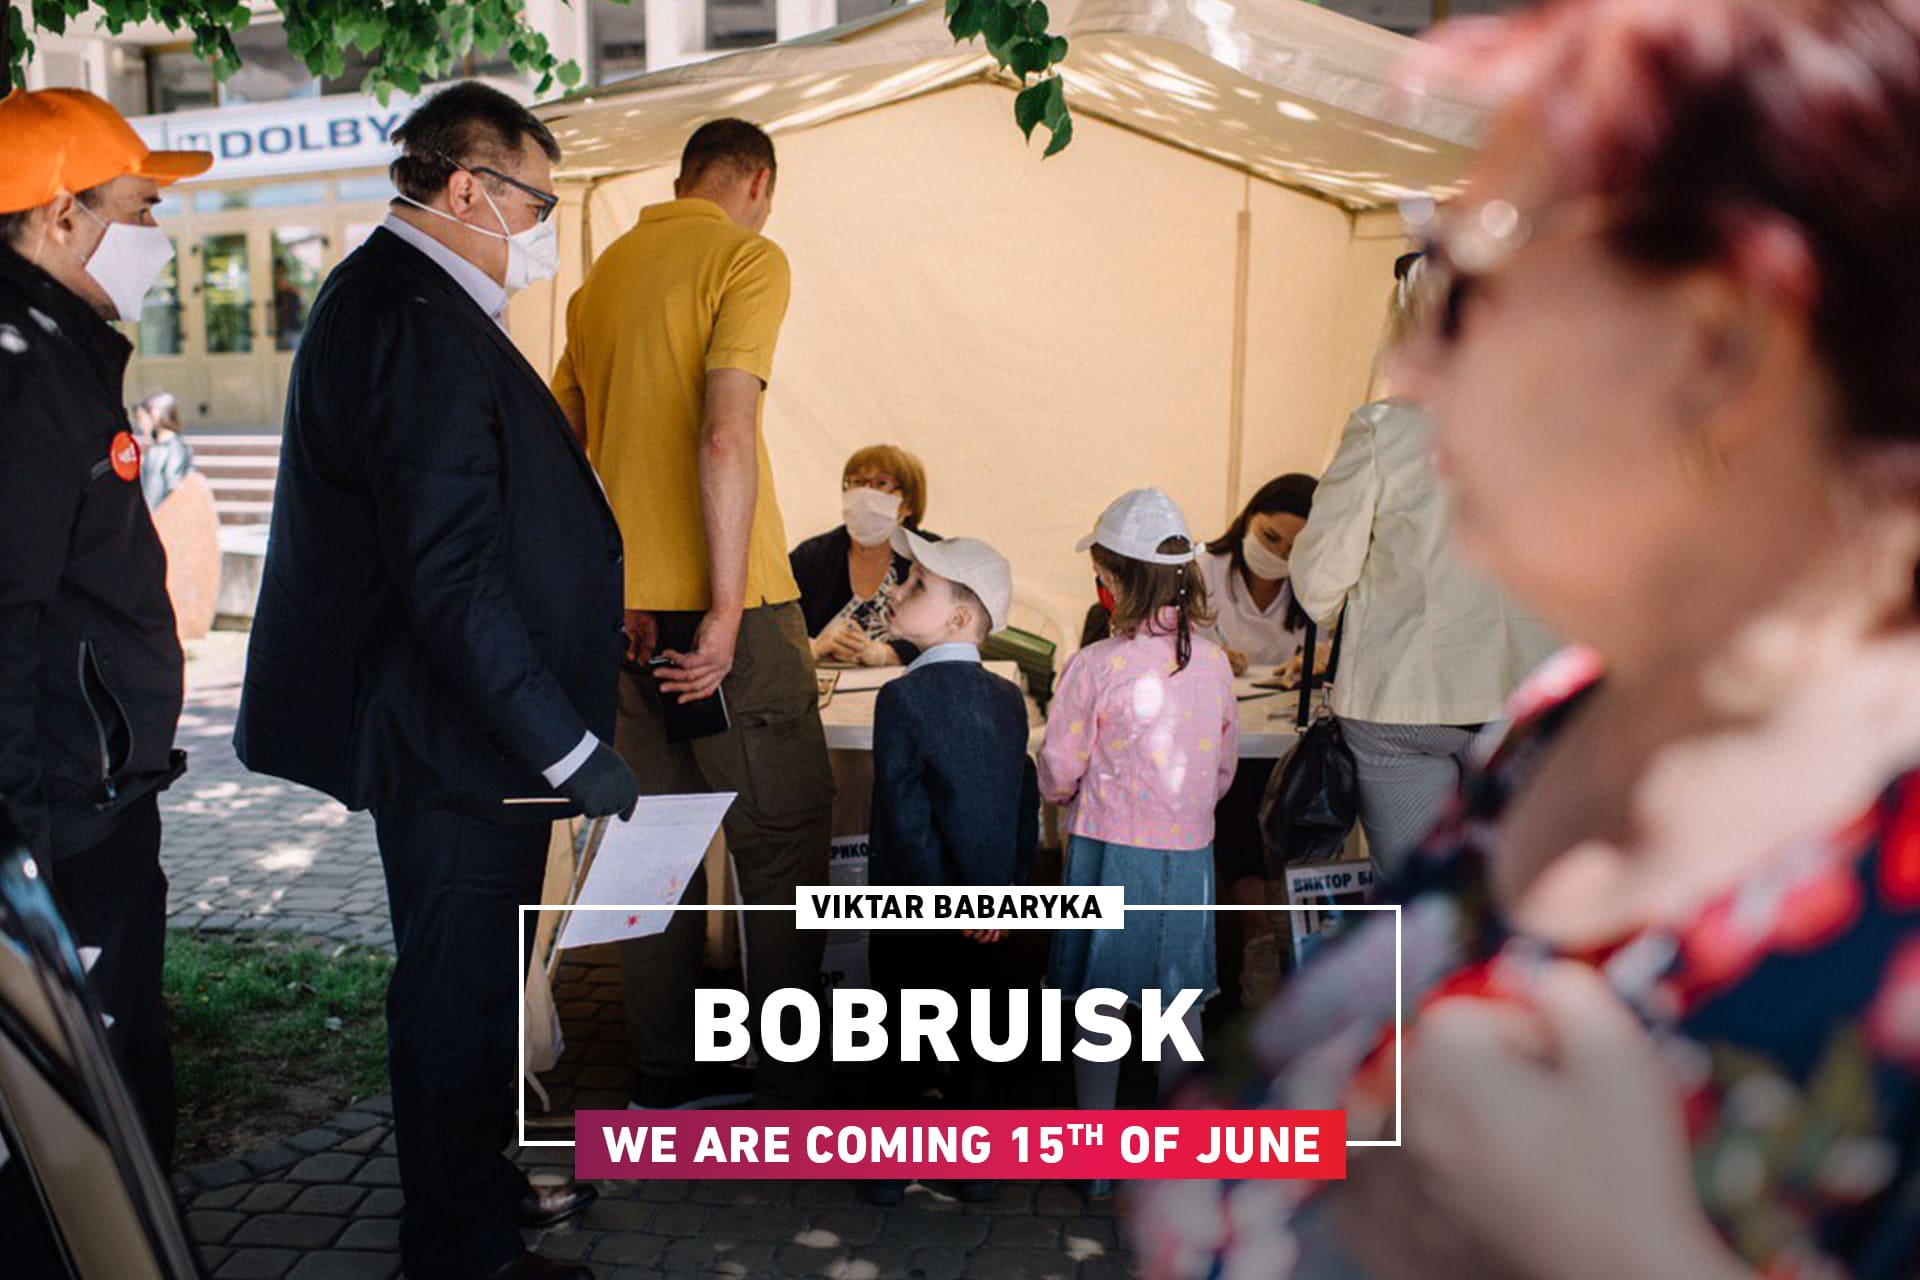 Viktar Babaryka: Bobruisk, we are coming!